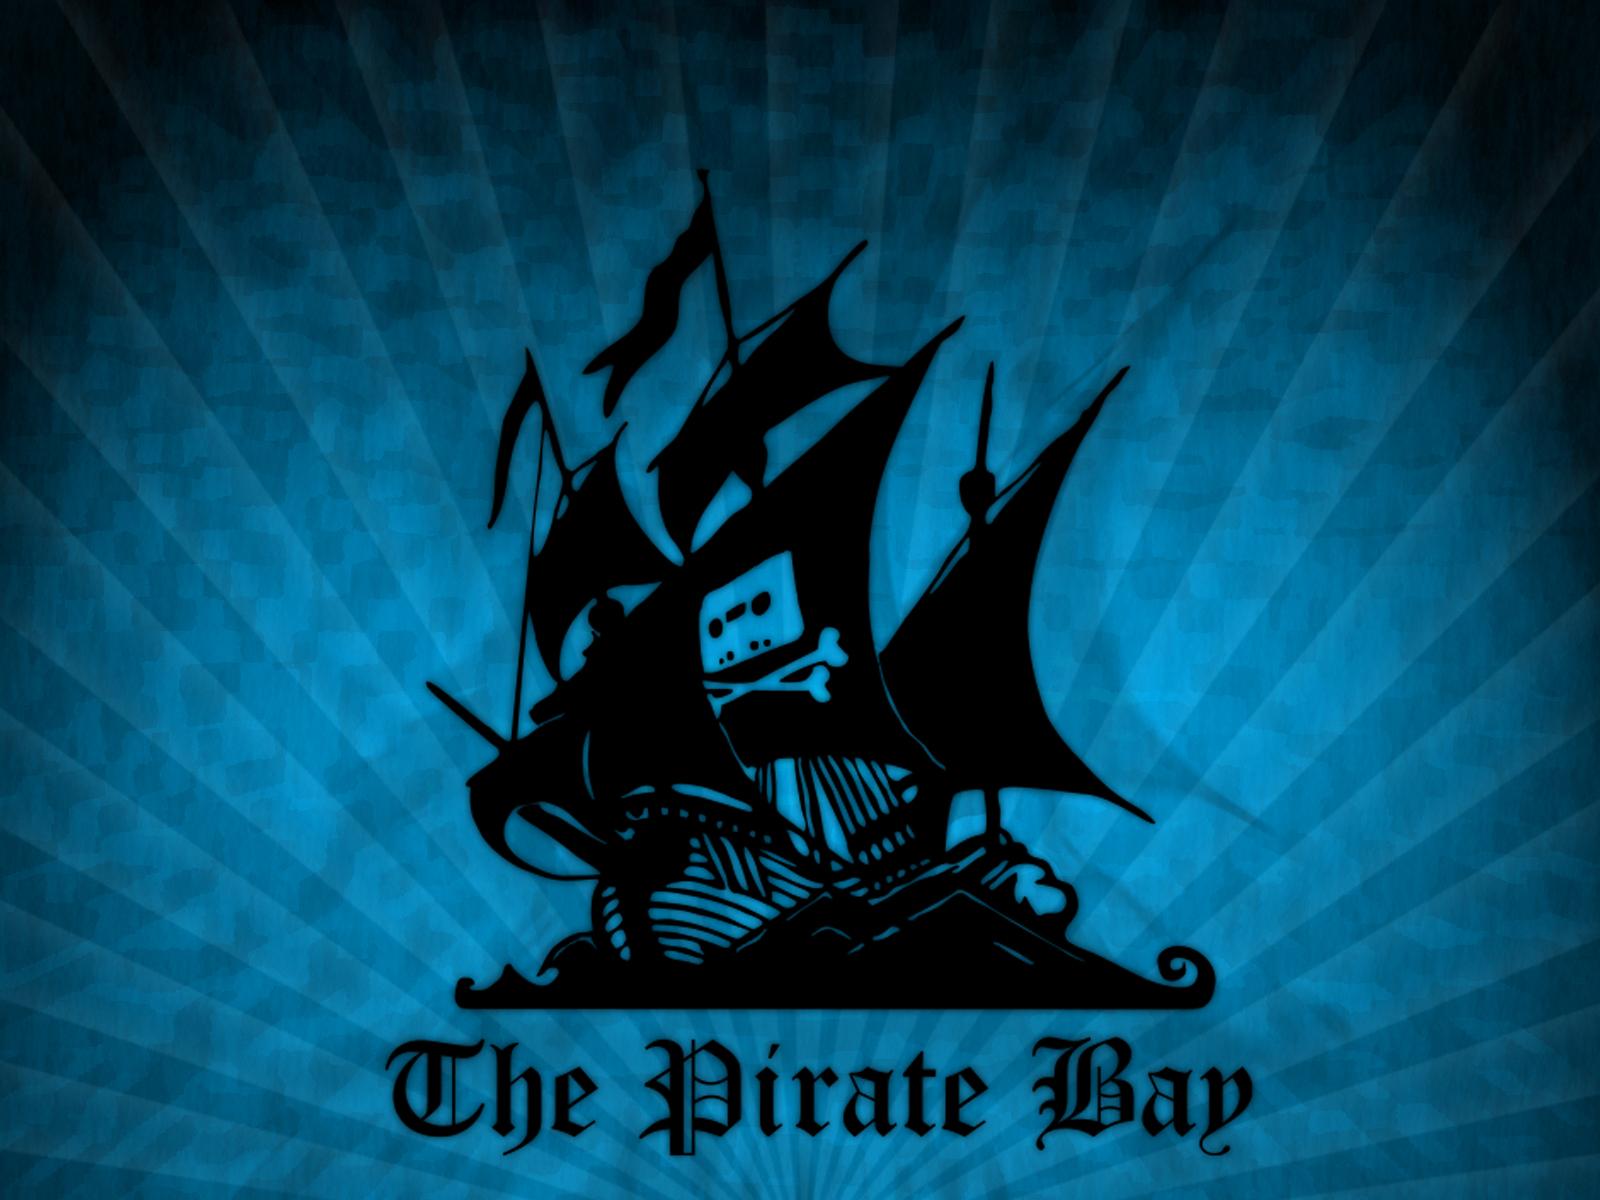 pirate bay wallpaper by jason611 on deviantart